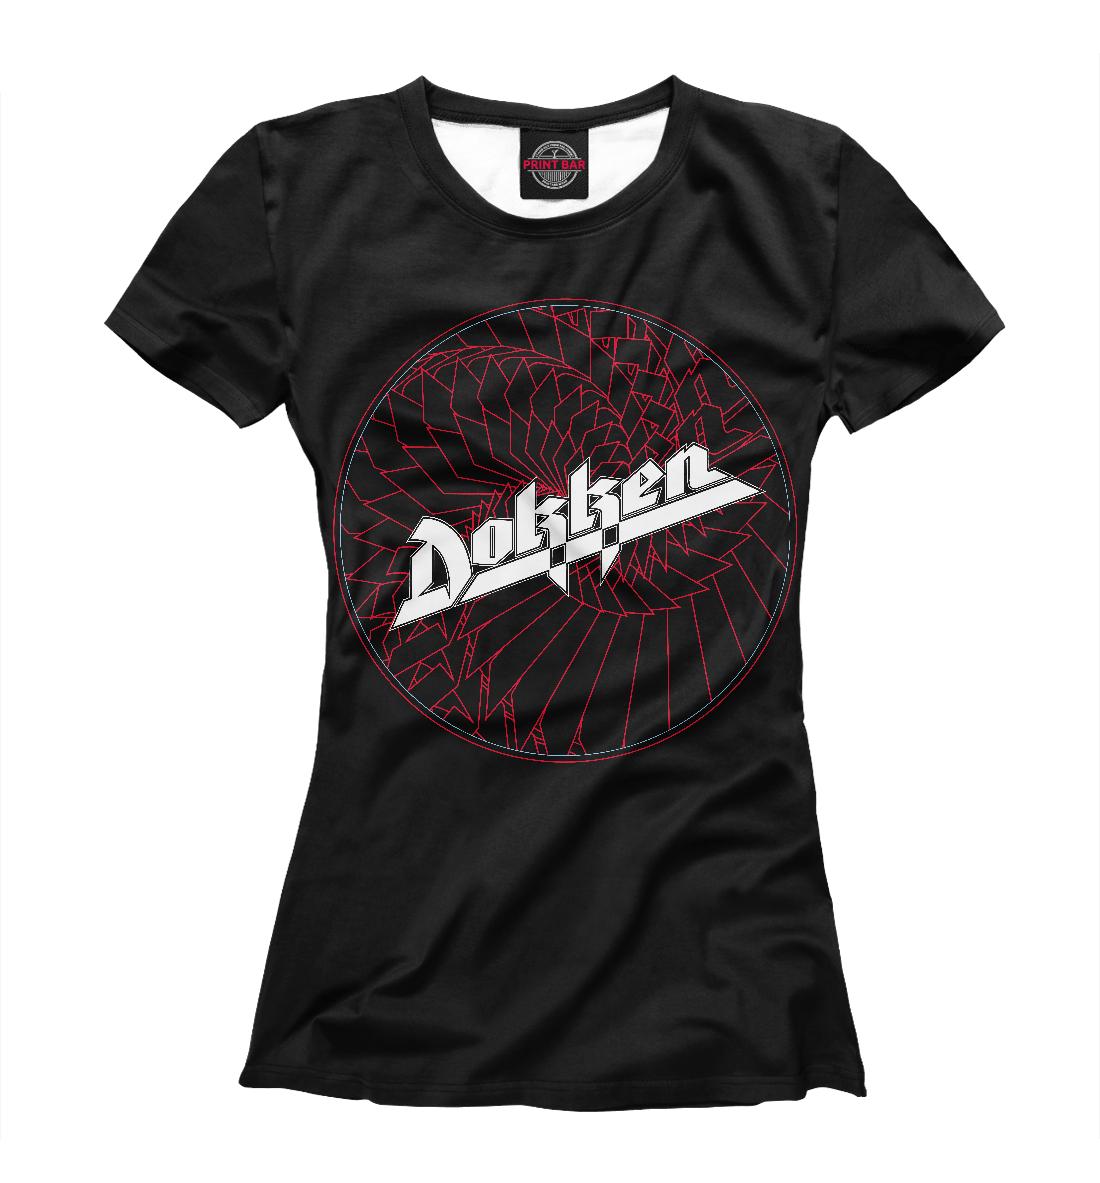 Купить Dokken: Breaking The Chains, Printbar, Футболки, APD-956707-fut-1